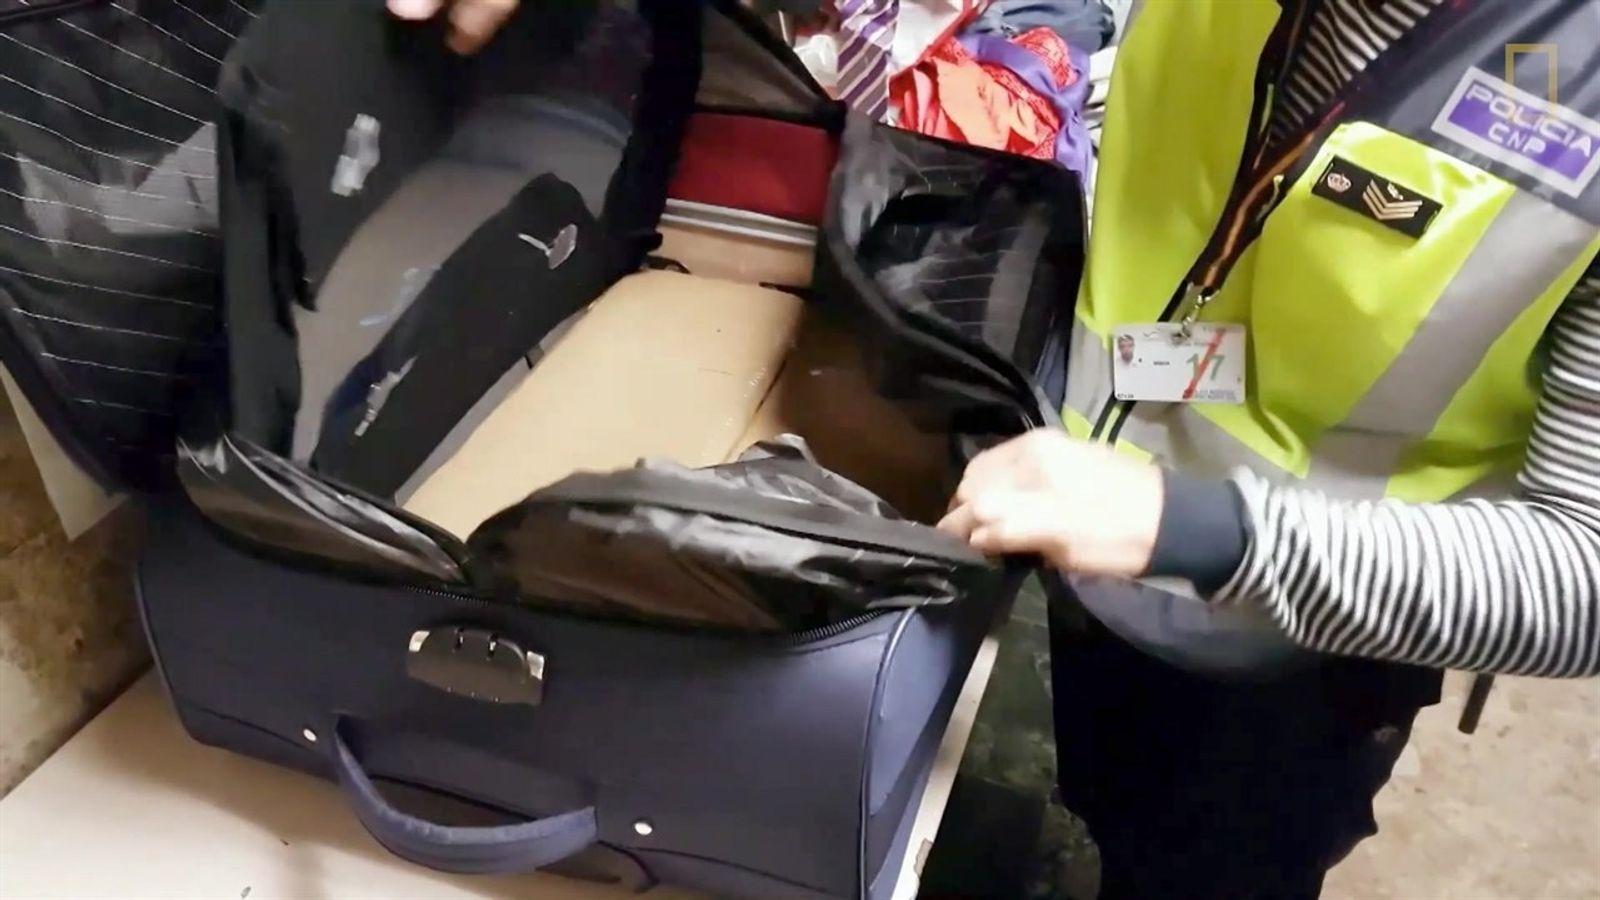 Aeroporto: Madri: Flagras em Barajas